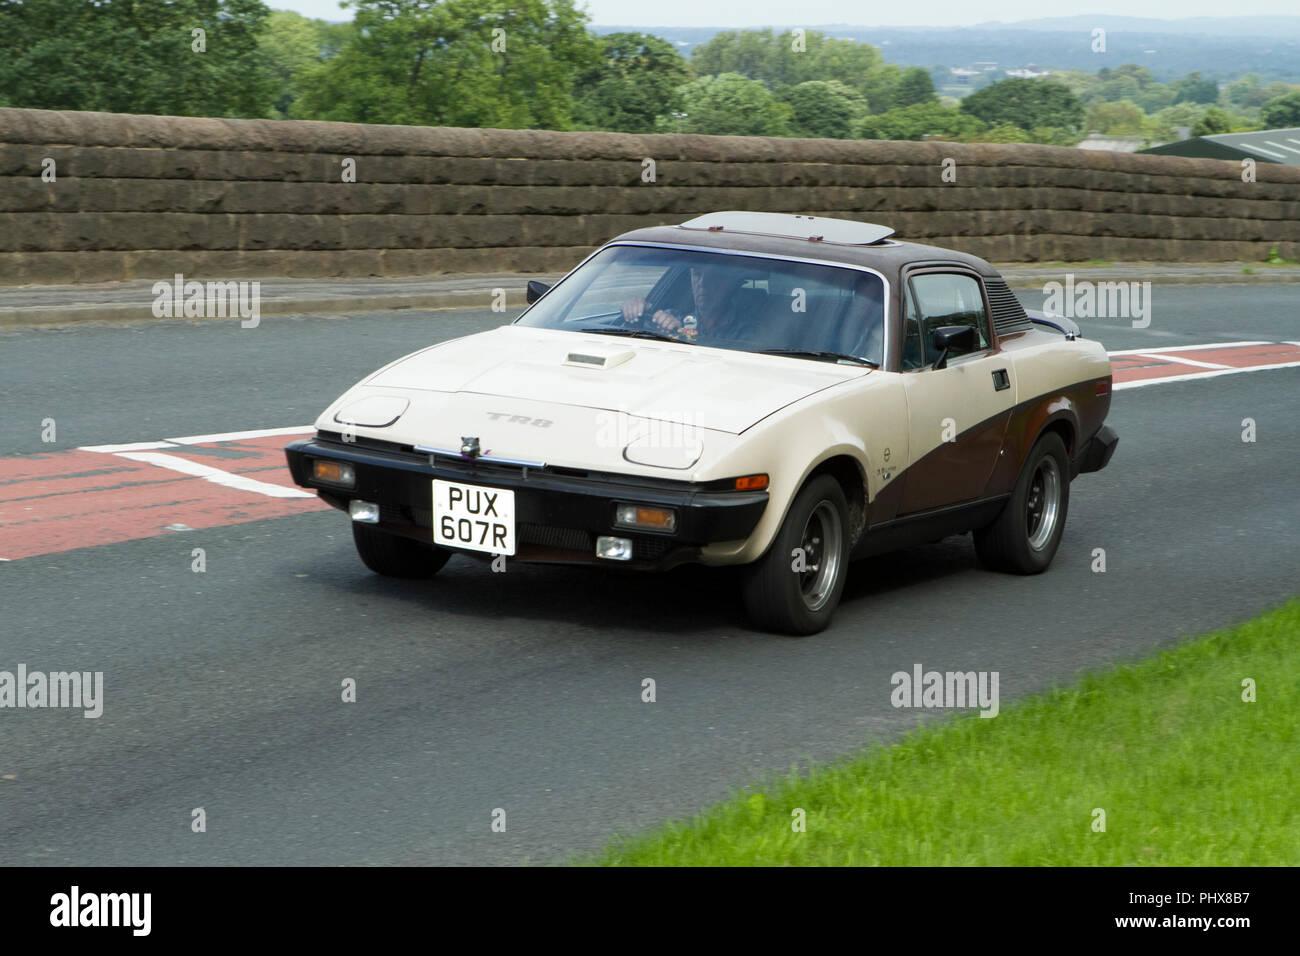 1976 Triumph Tr7 Pux607r Classic Cars Veteran Restored Car